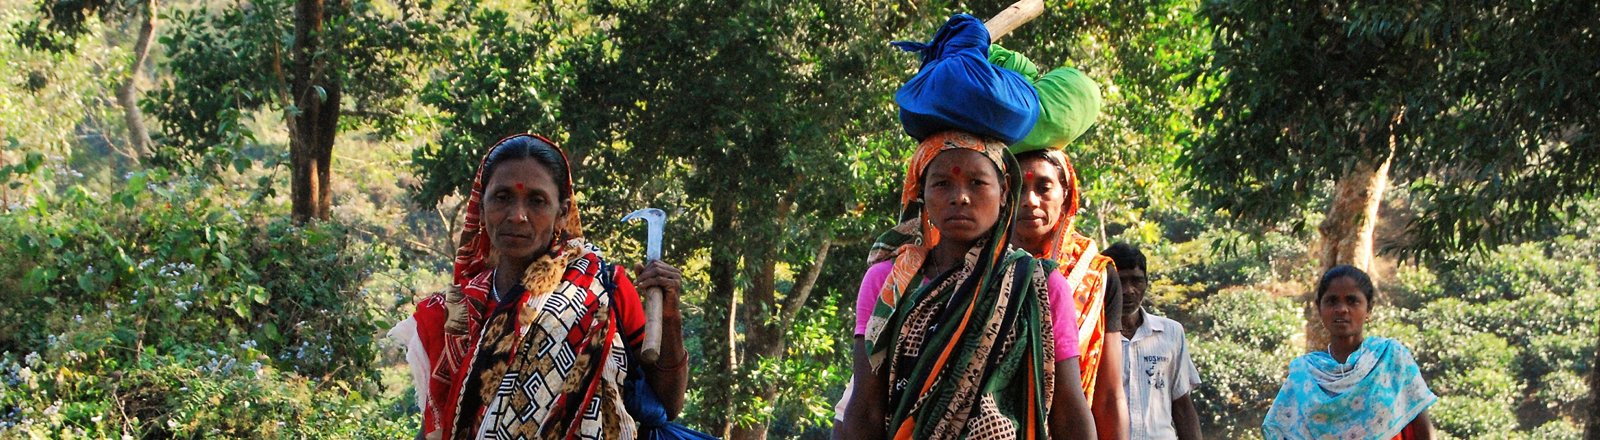 Teearbeiterinnen in Bangladesch